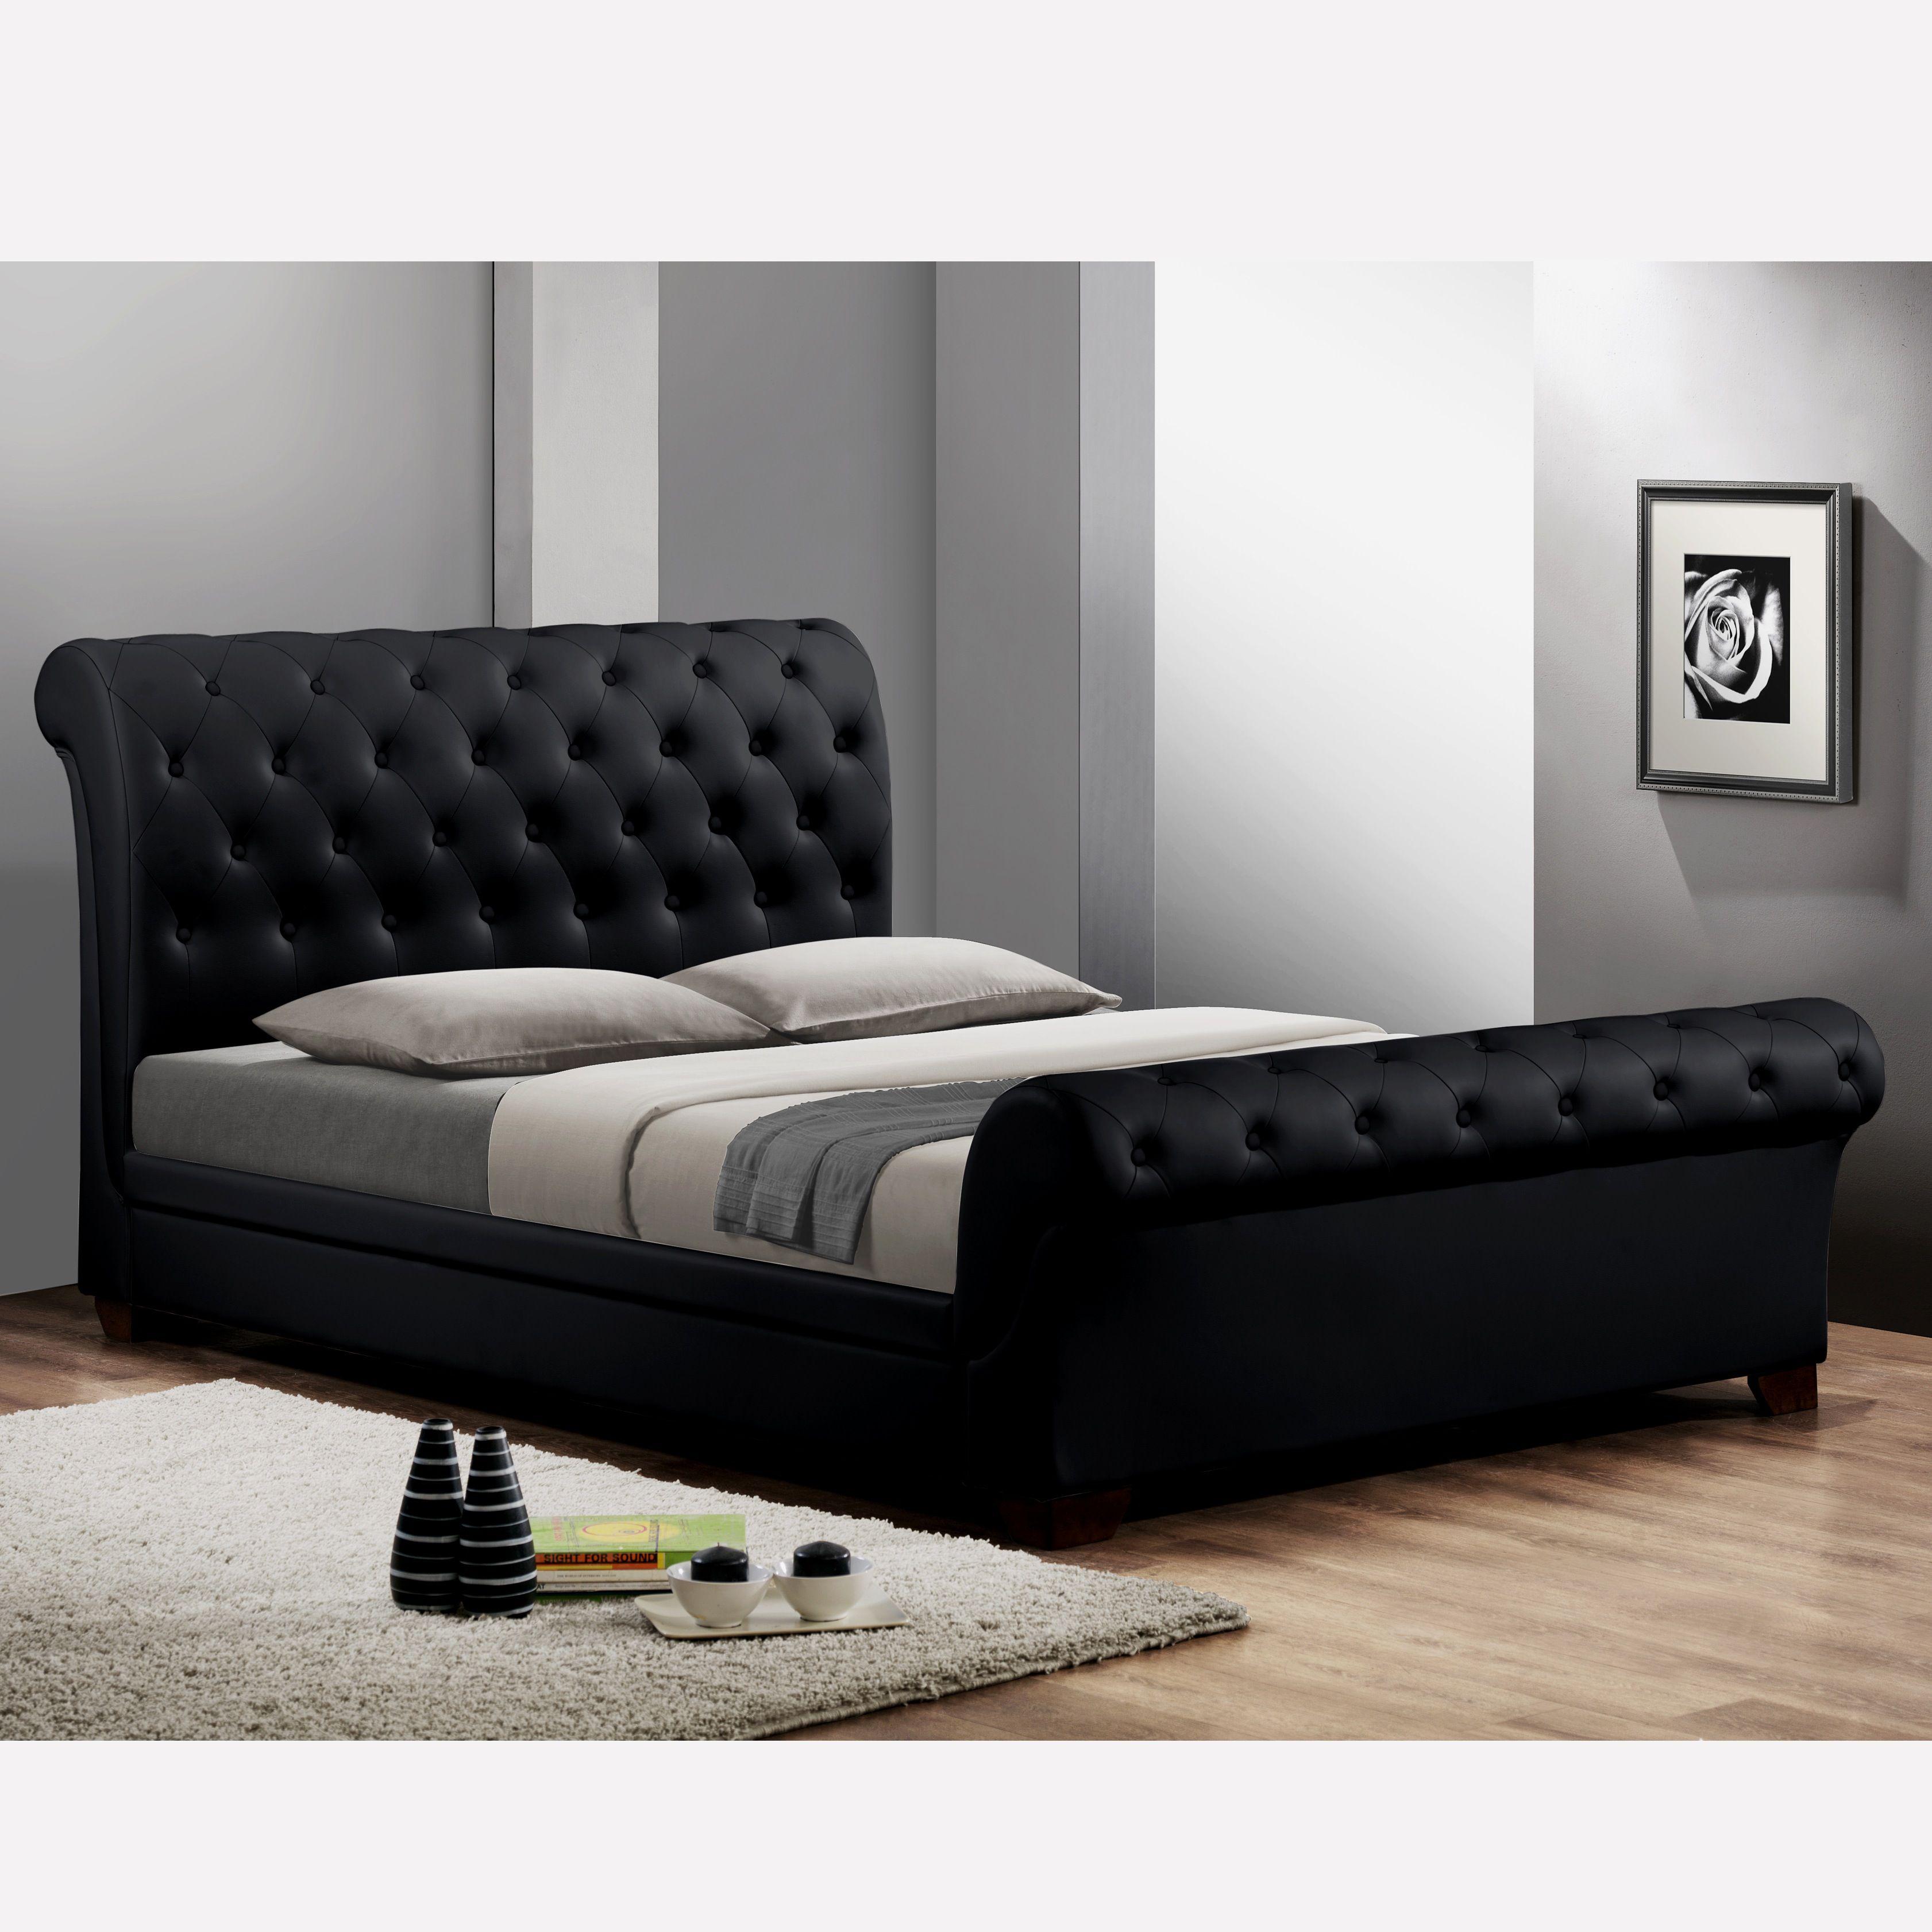 Amazing Black Tufted Headboard Queen Modern Bed Queen Upholstered Headboard Upholstered Sleigh Bed Black Upholstered Bed